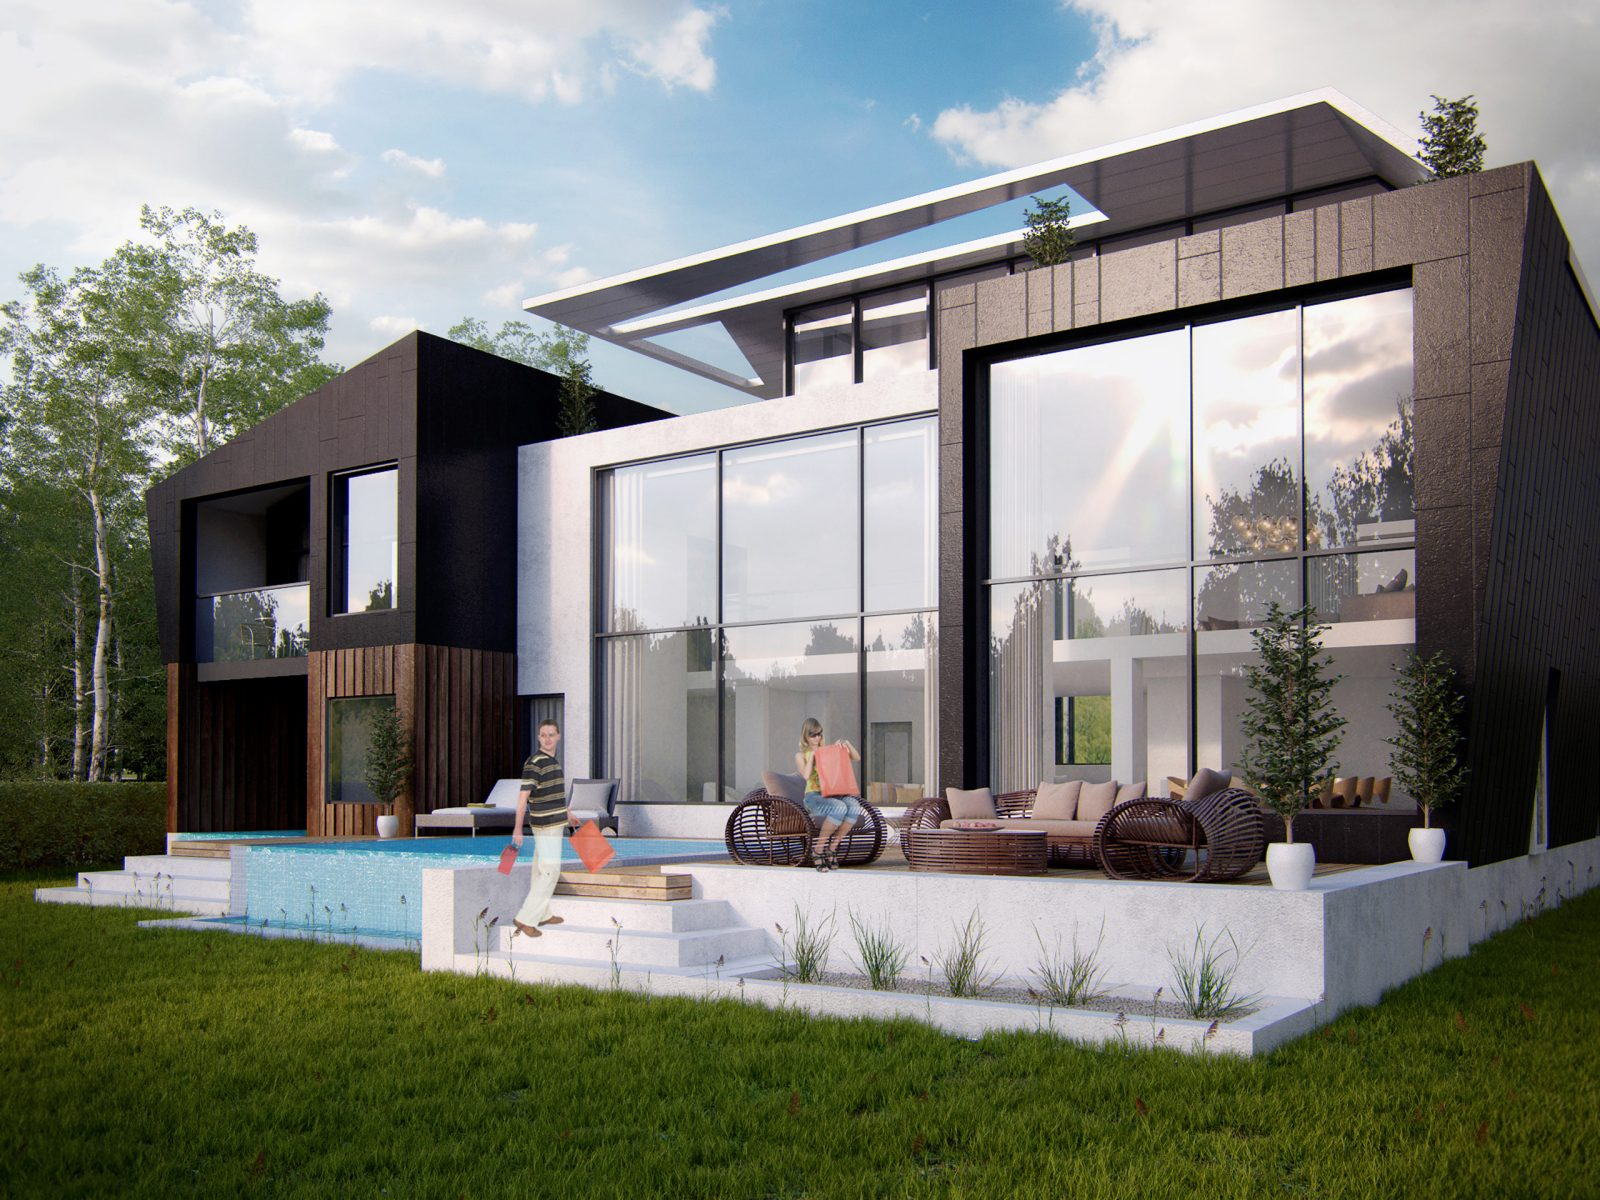 weathervane house modern architecture saundersfoot pembrokeshire architects jersey5